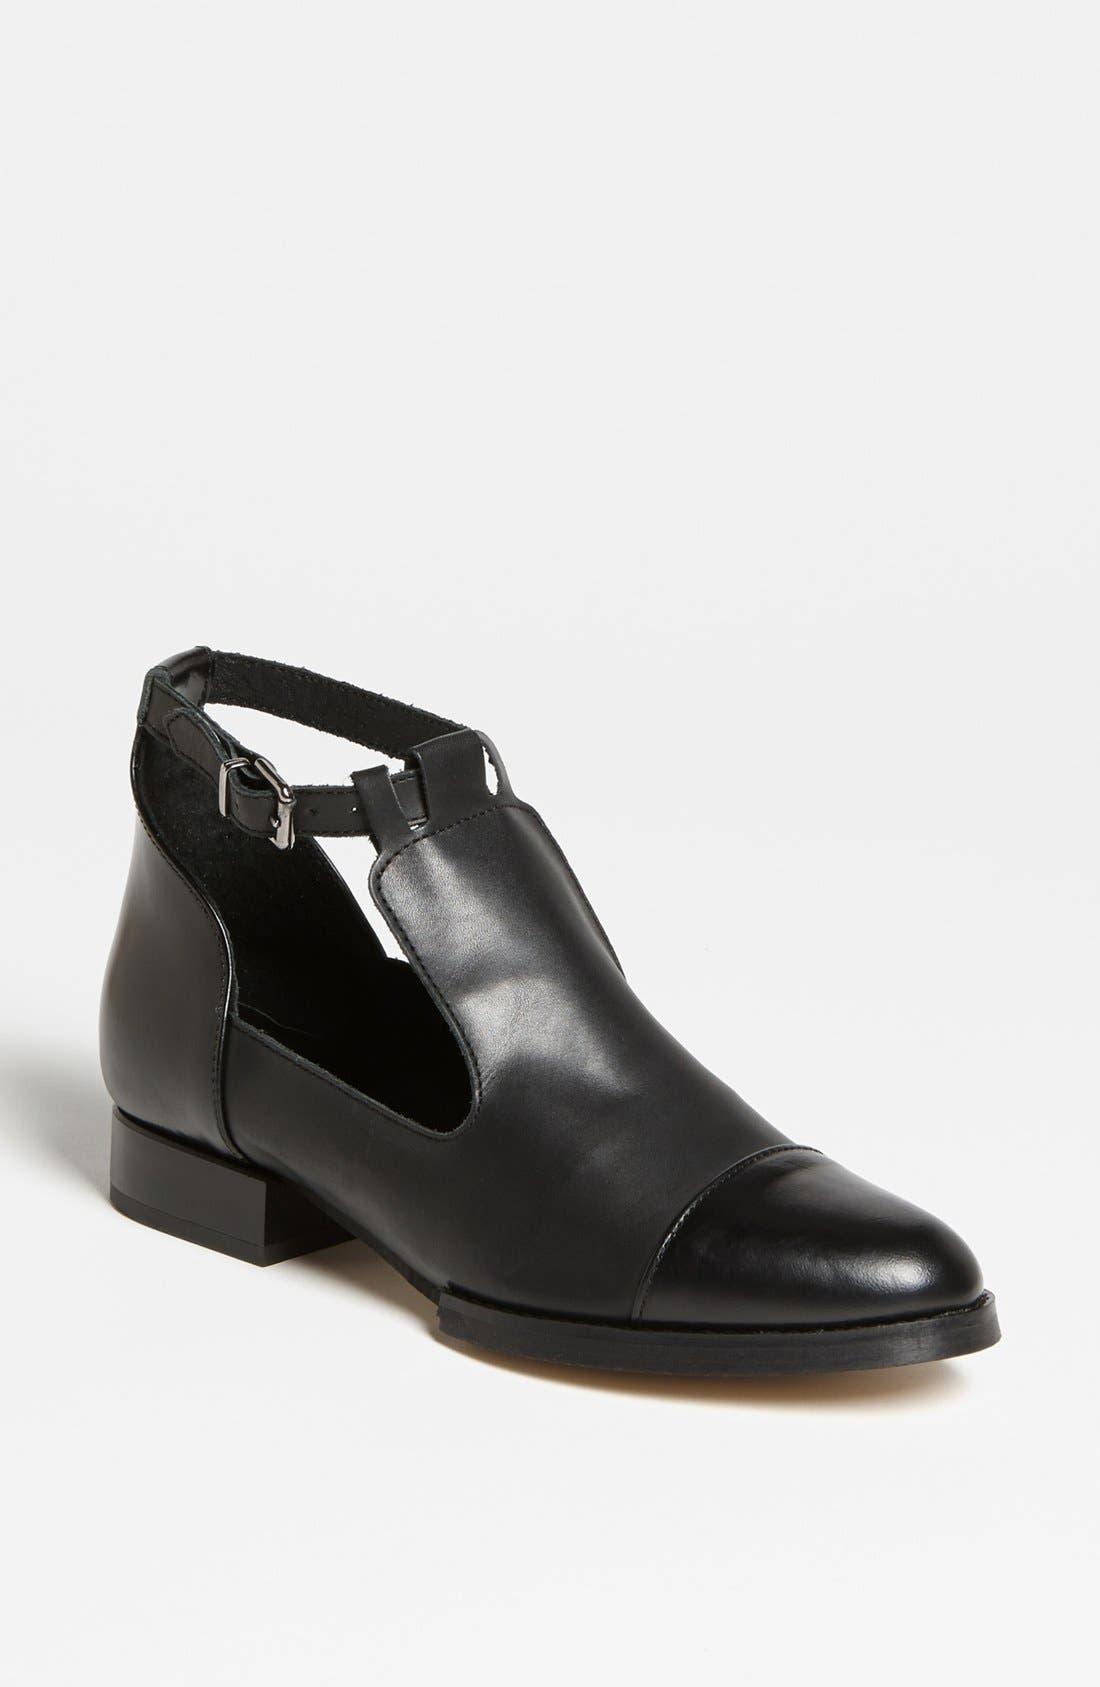 Main Image - Topshop 'Katz' Shoe